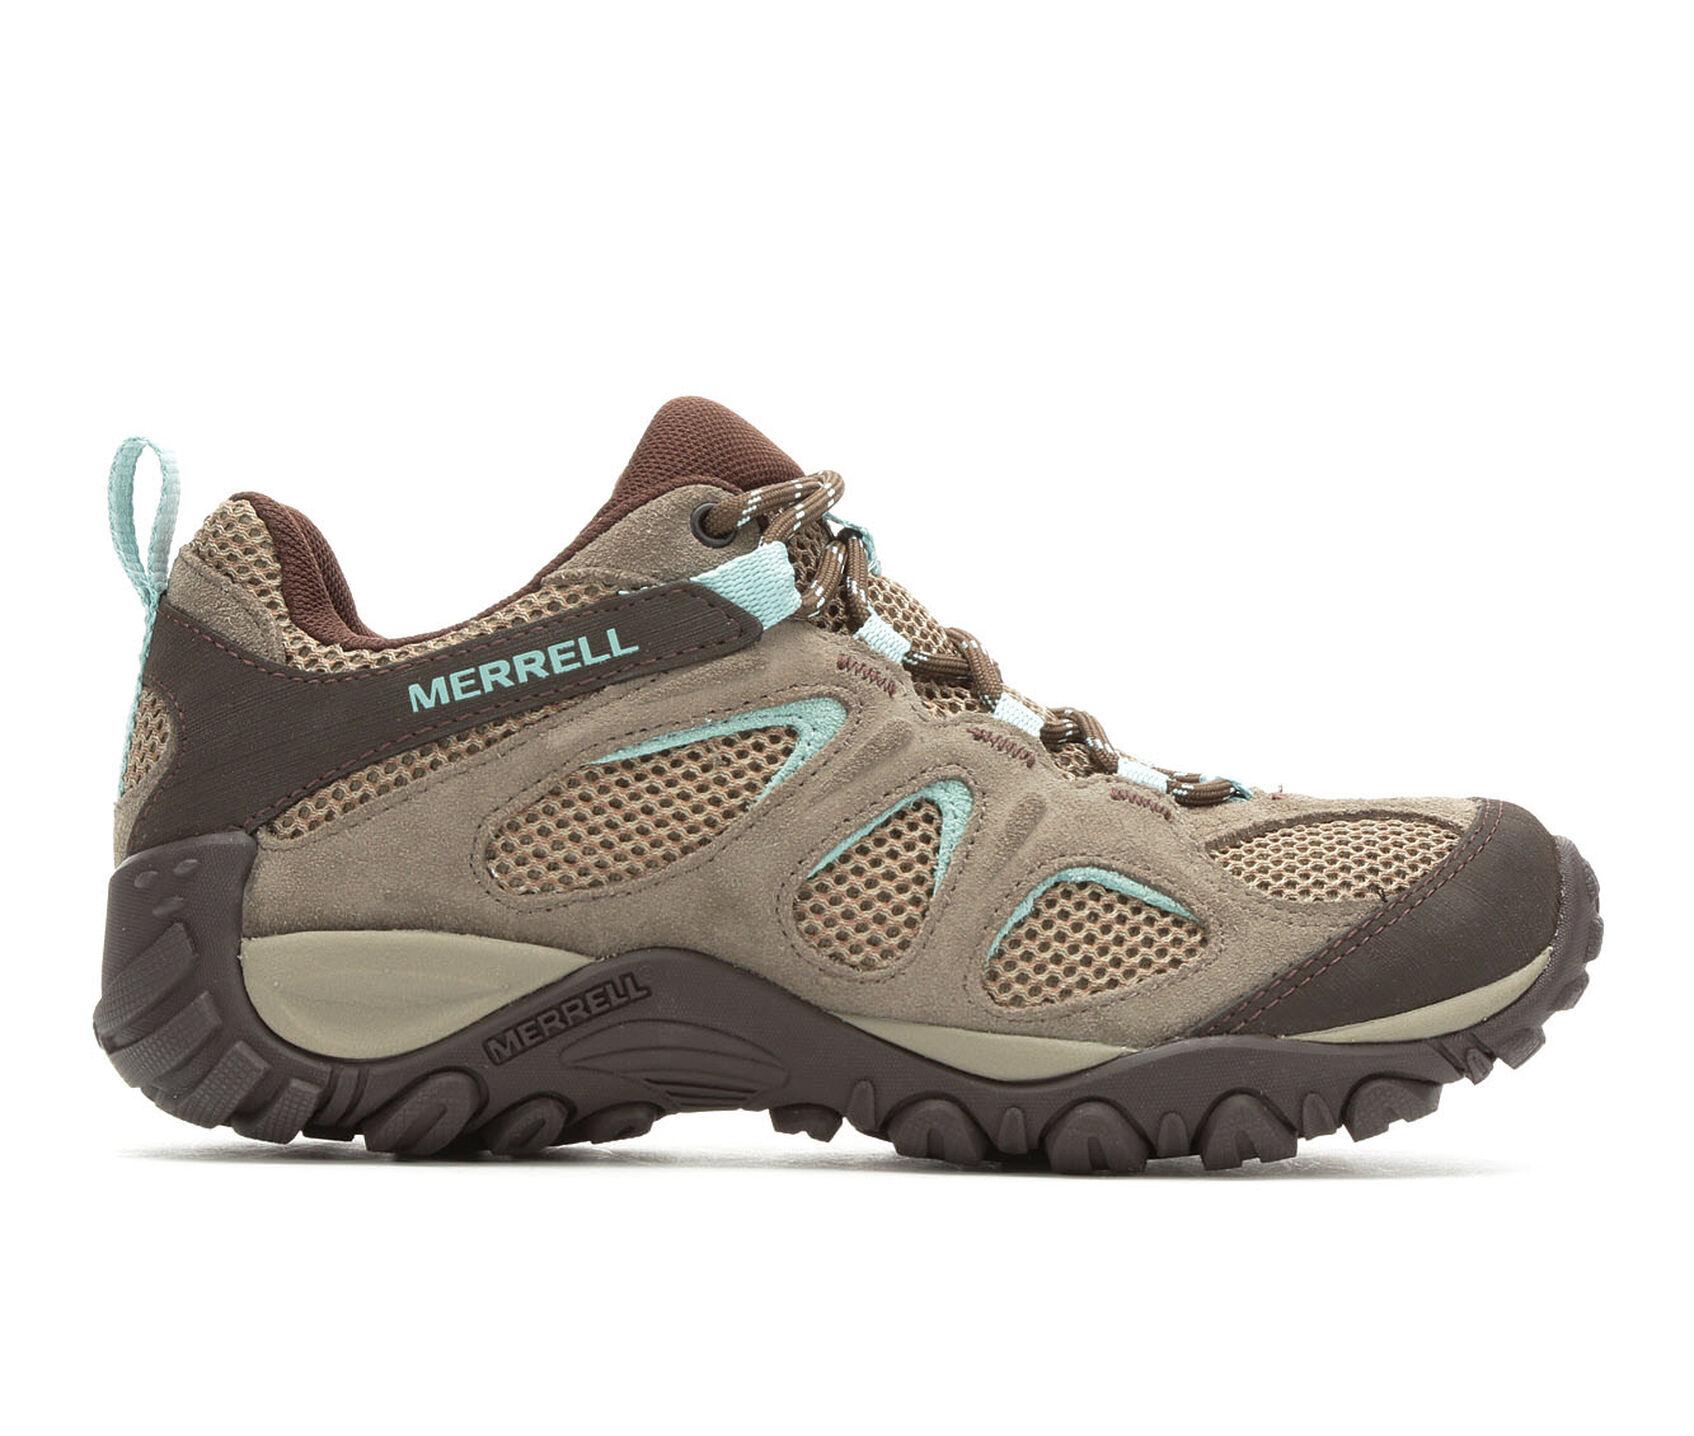 a1d2ebabfd Women's Merrell Yokota 2 Hiking Boots | Shoe Carnival